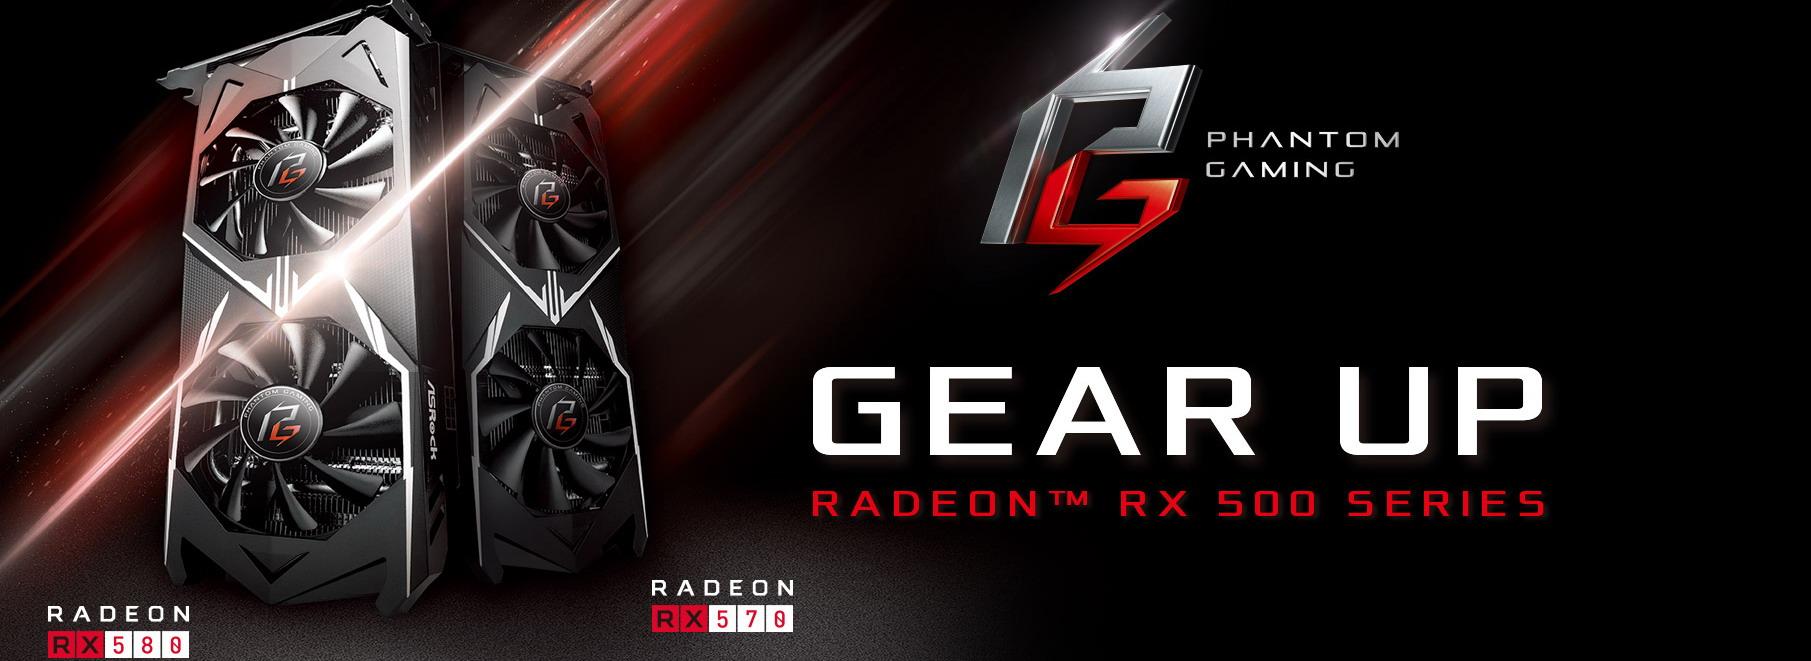 AsRock Phantom RX570 4GB & 8GB - New AMD Mining GPUs Coming Out Soon